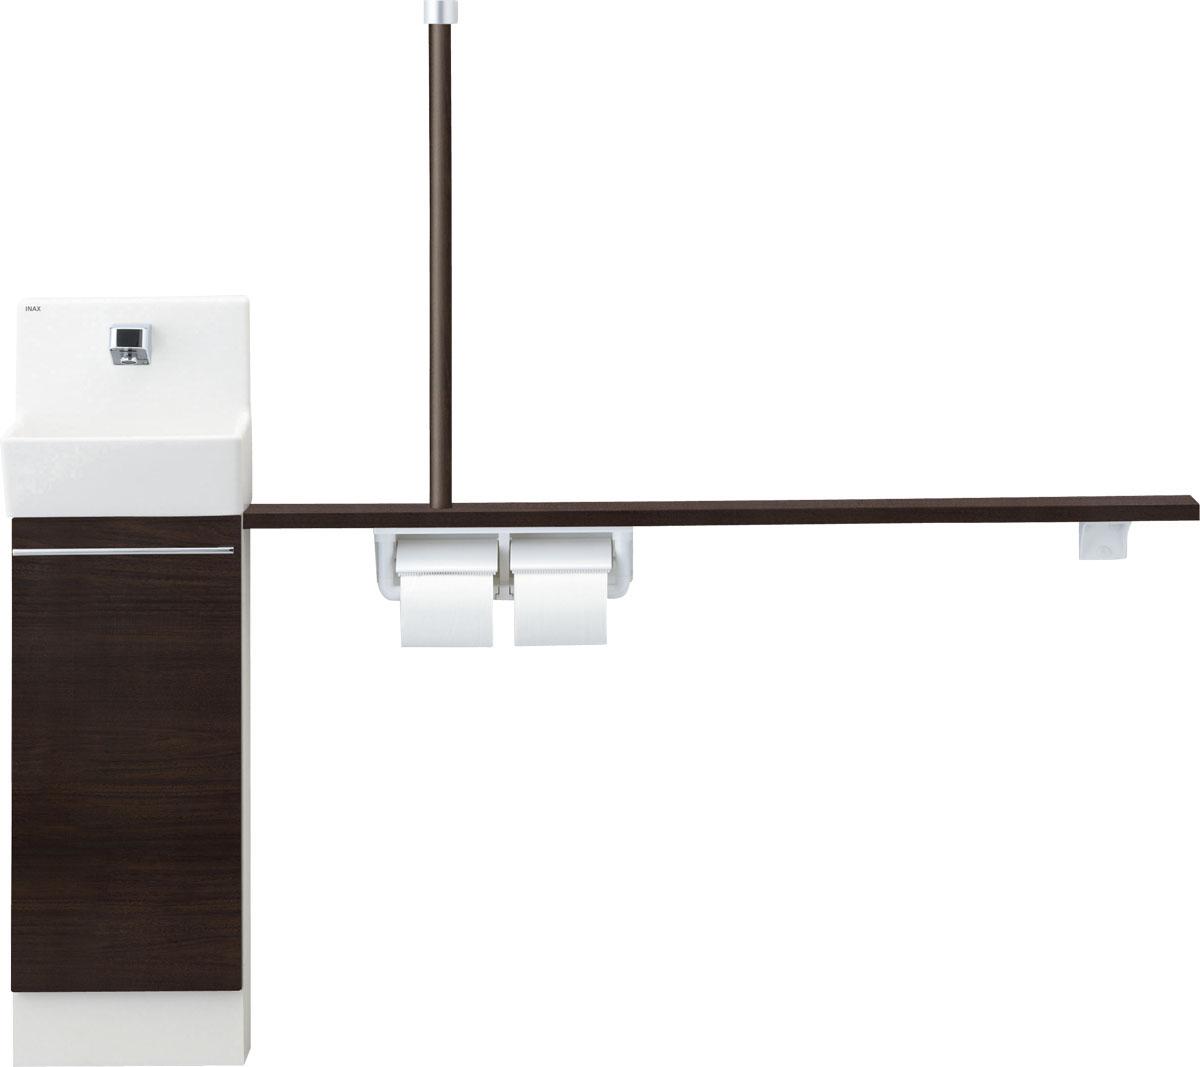 LIXIL INAX トイレ手洗 コフレル スリム(埋込)カウンター間口1200サイズ YL-DA82VTH12B